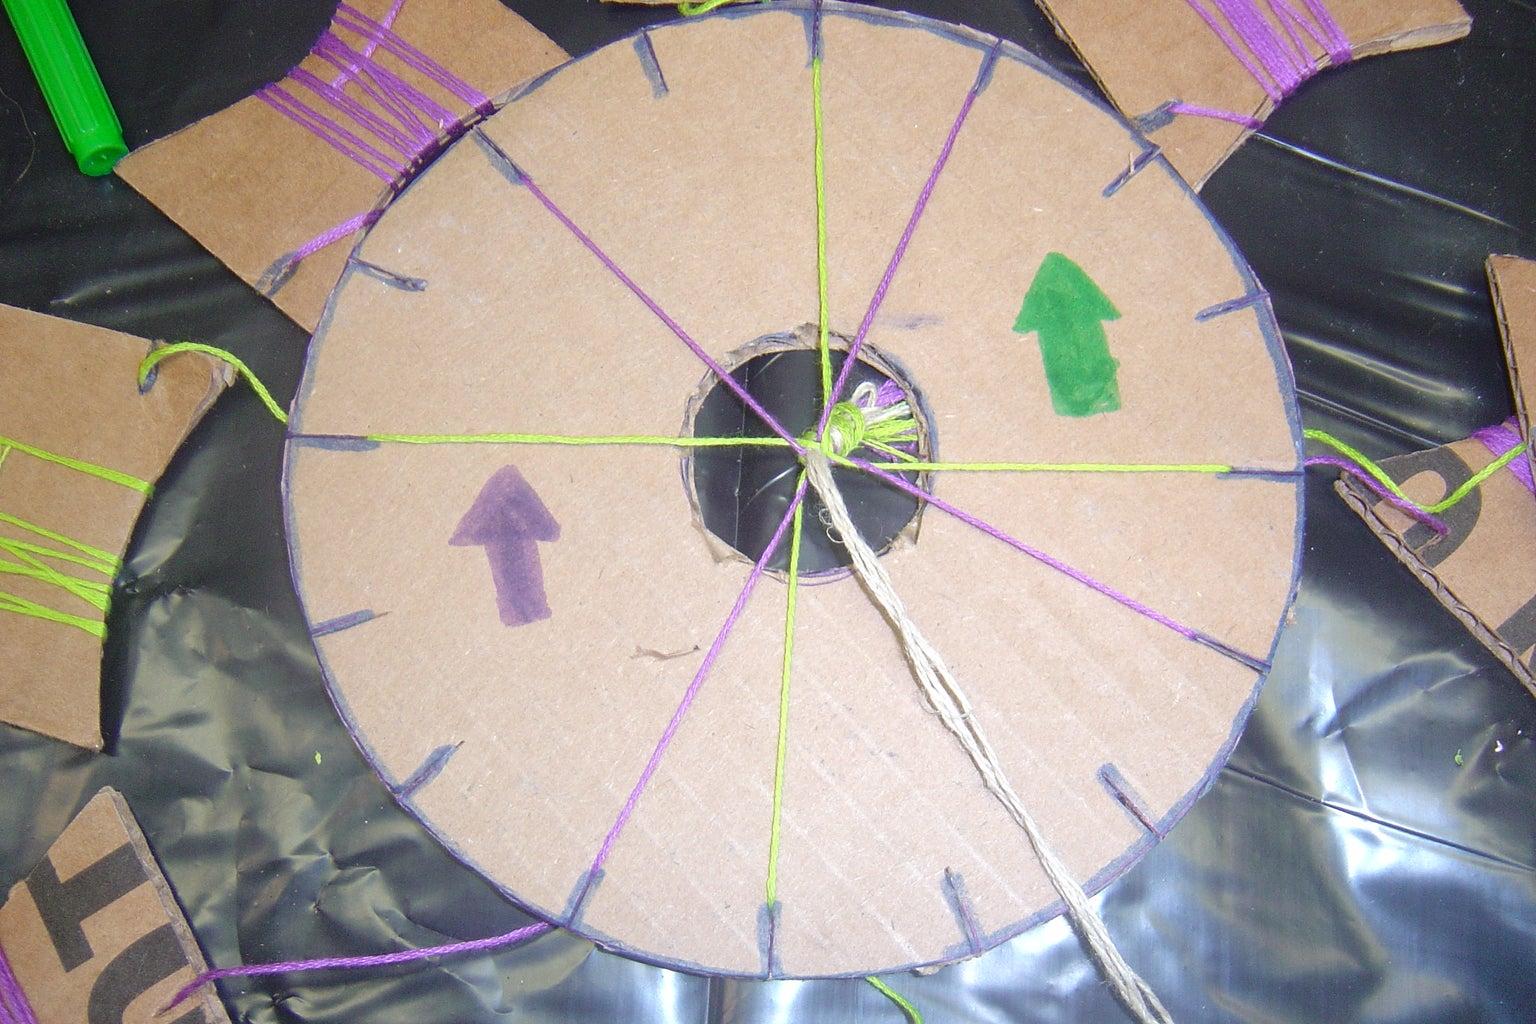 Making the Kimihimo Wheel & Bobbins